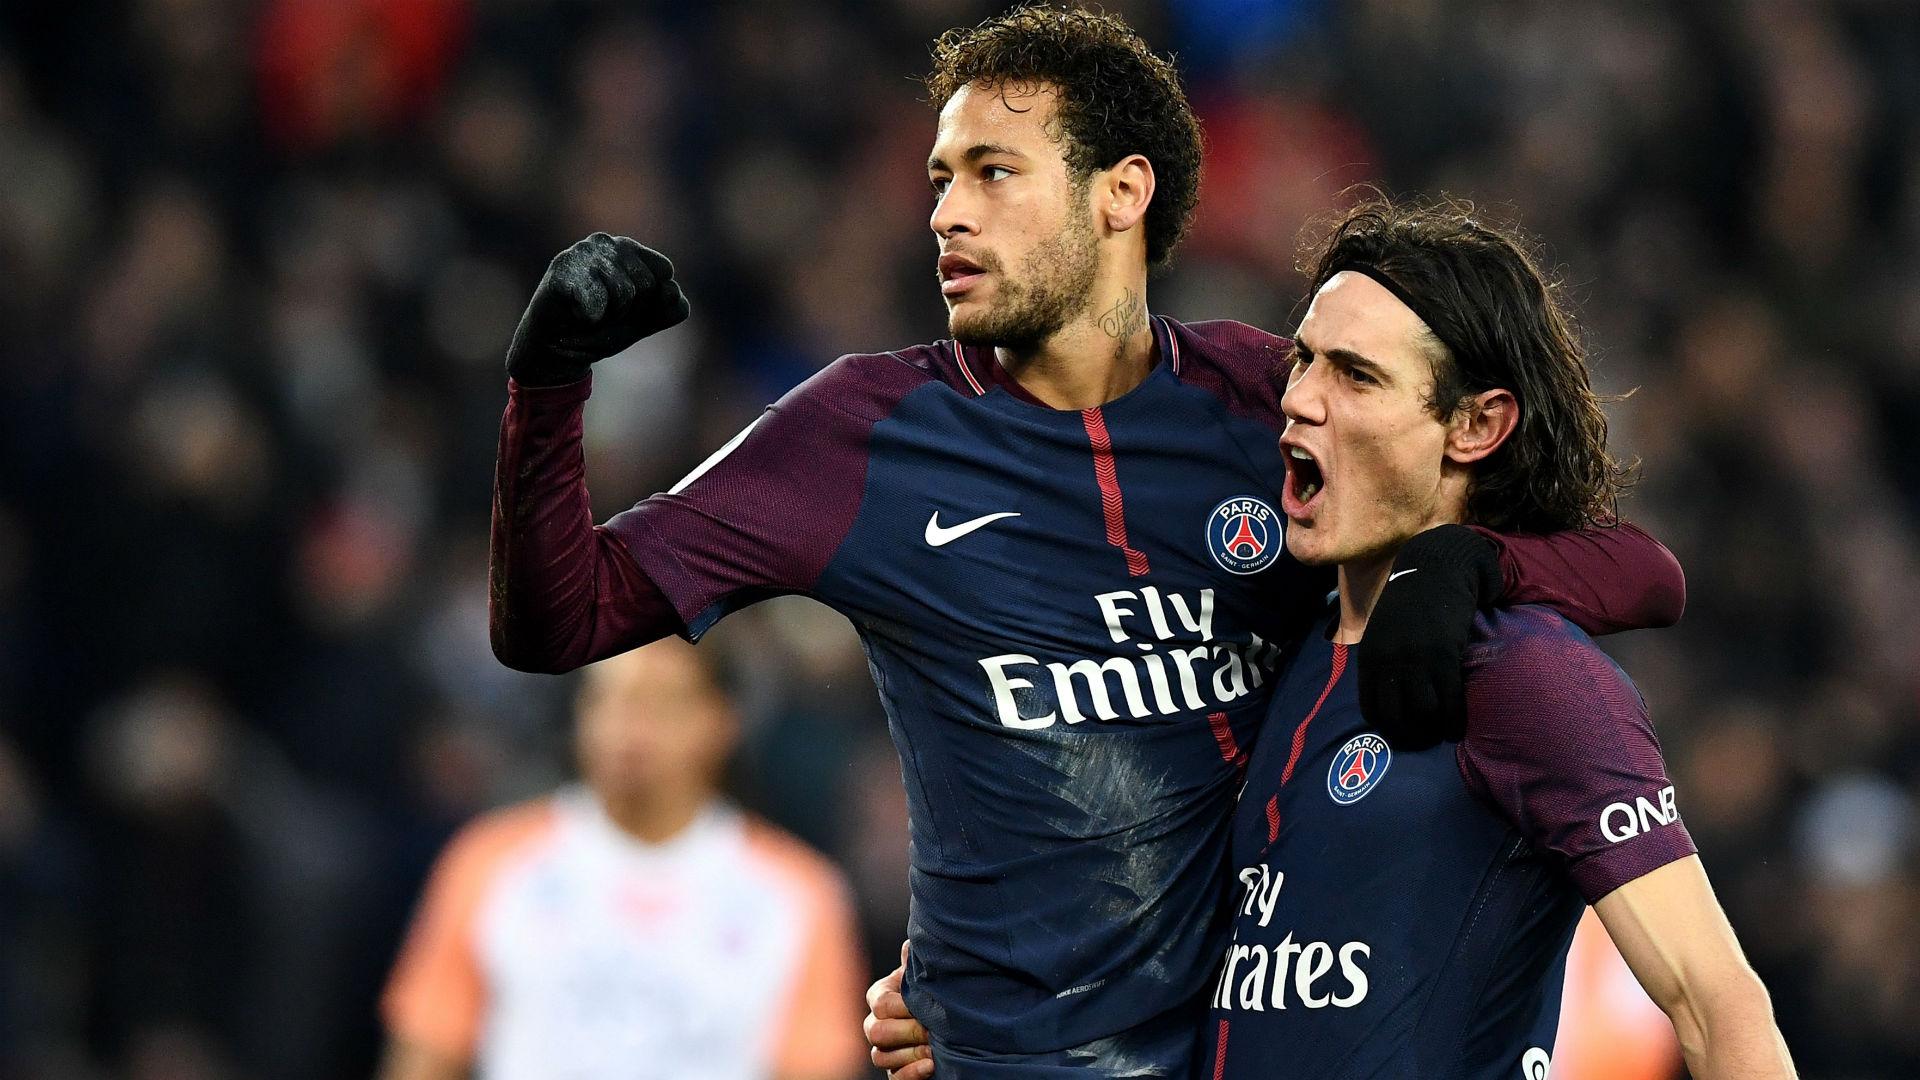 Edinson Cavani Neymar PSG Montpellier Ligue 1 27012018